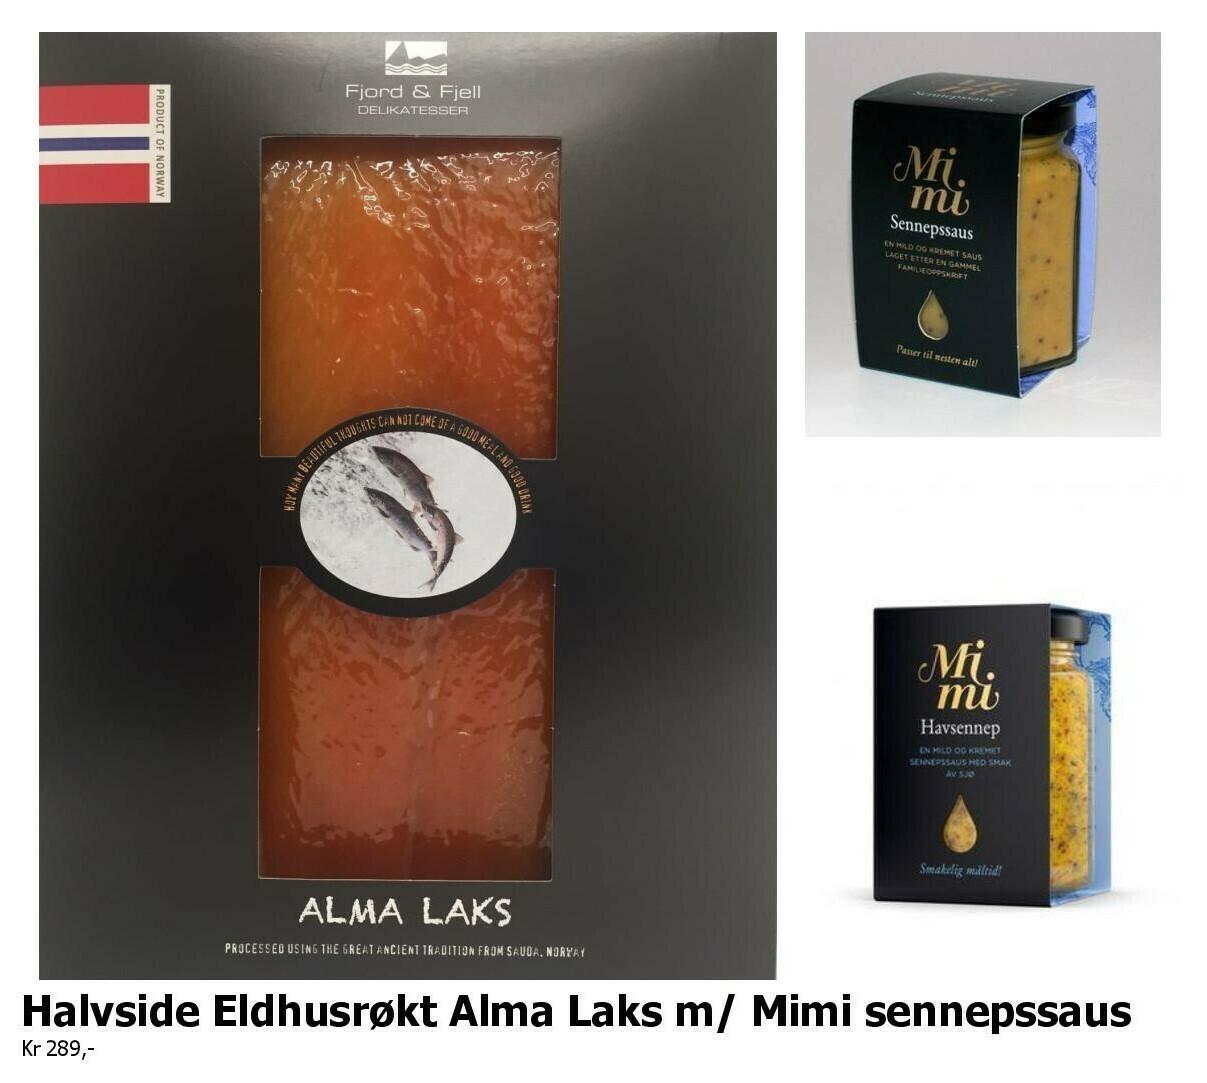 ELDHUSRØKT ALMA LAKS, 1/2 side m/ Mimi Sennepssaus